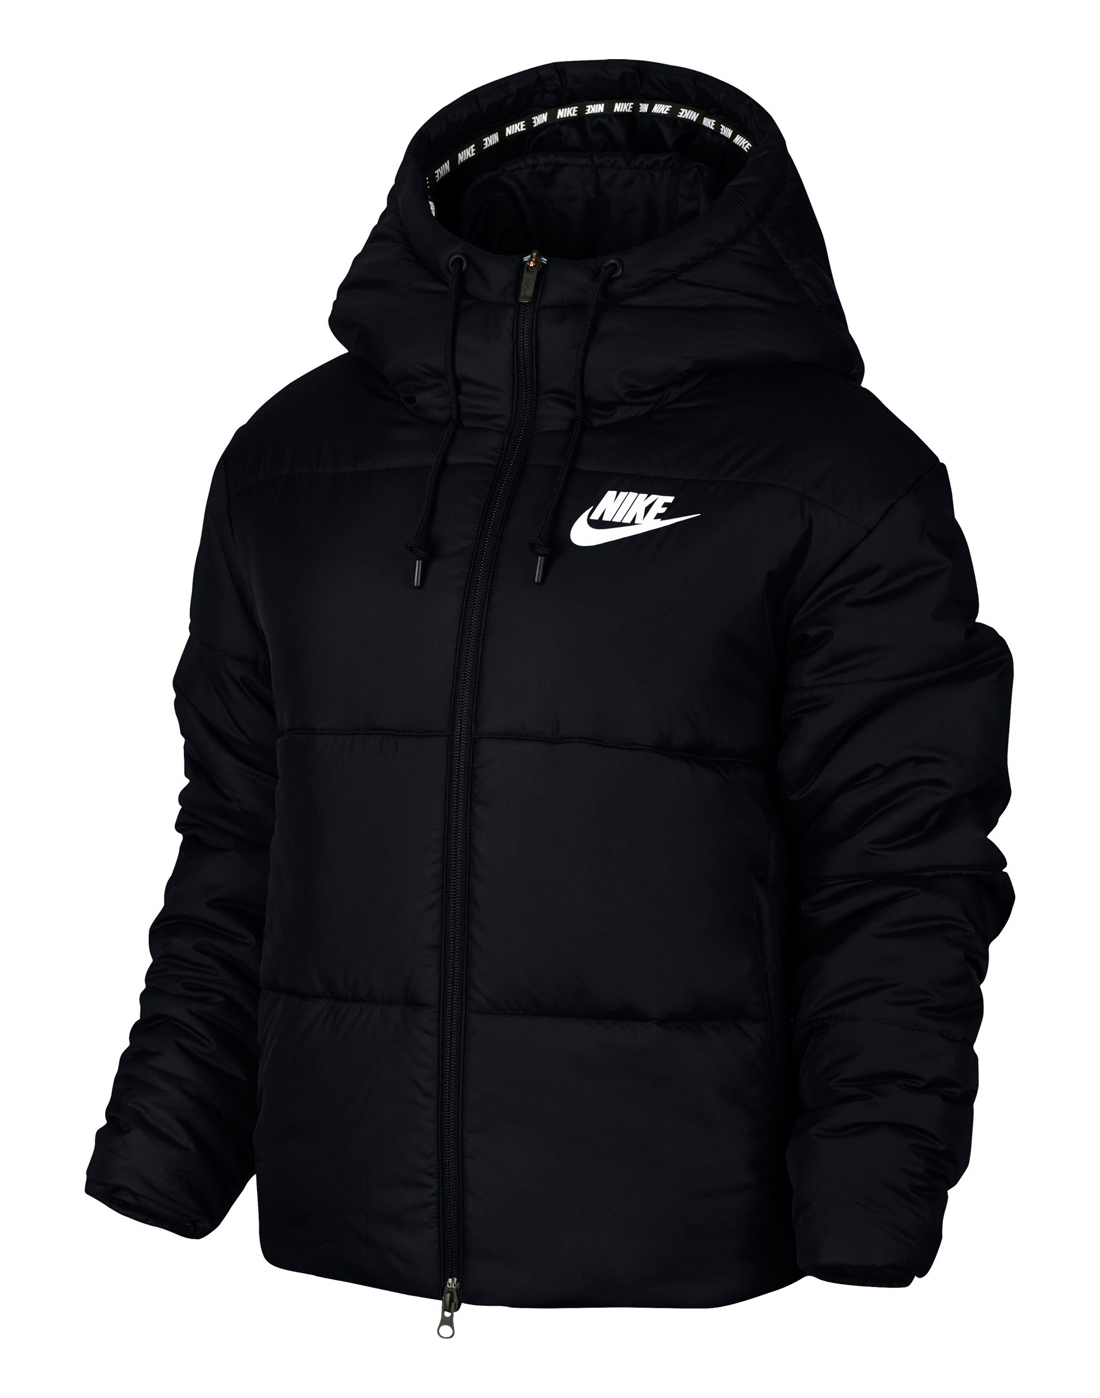 Nike Womens Puffa Jacket  97f2334c9